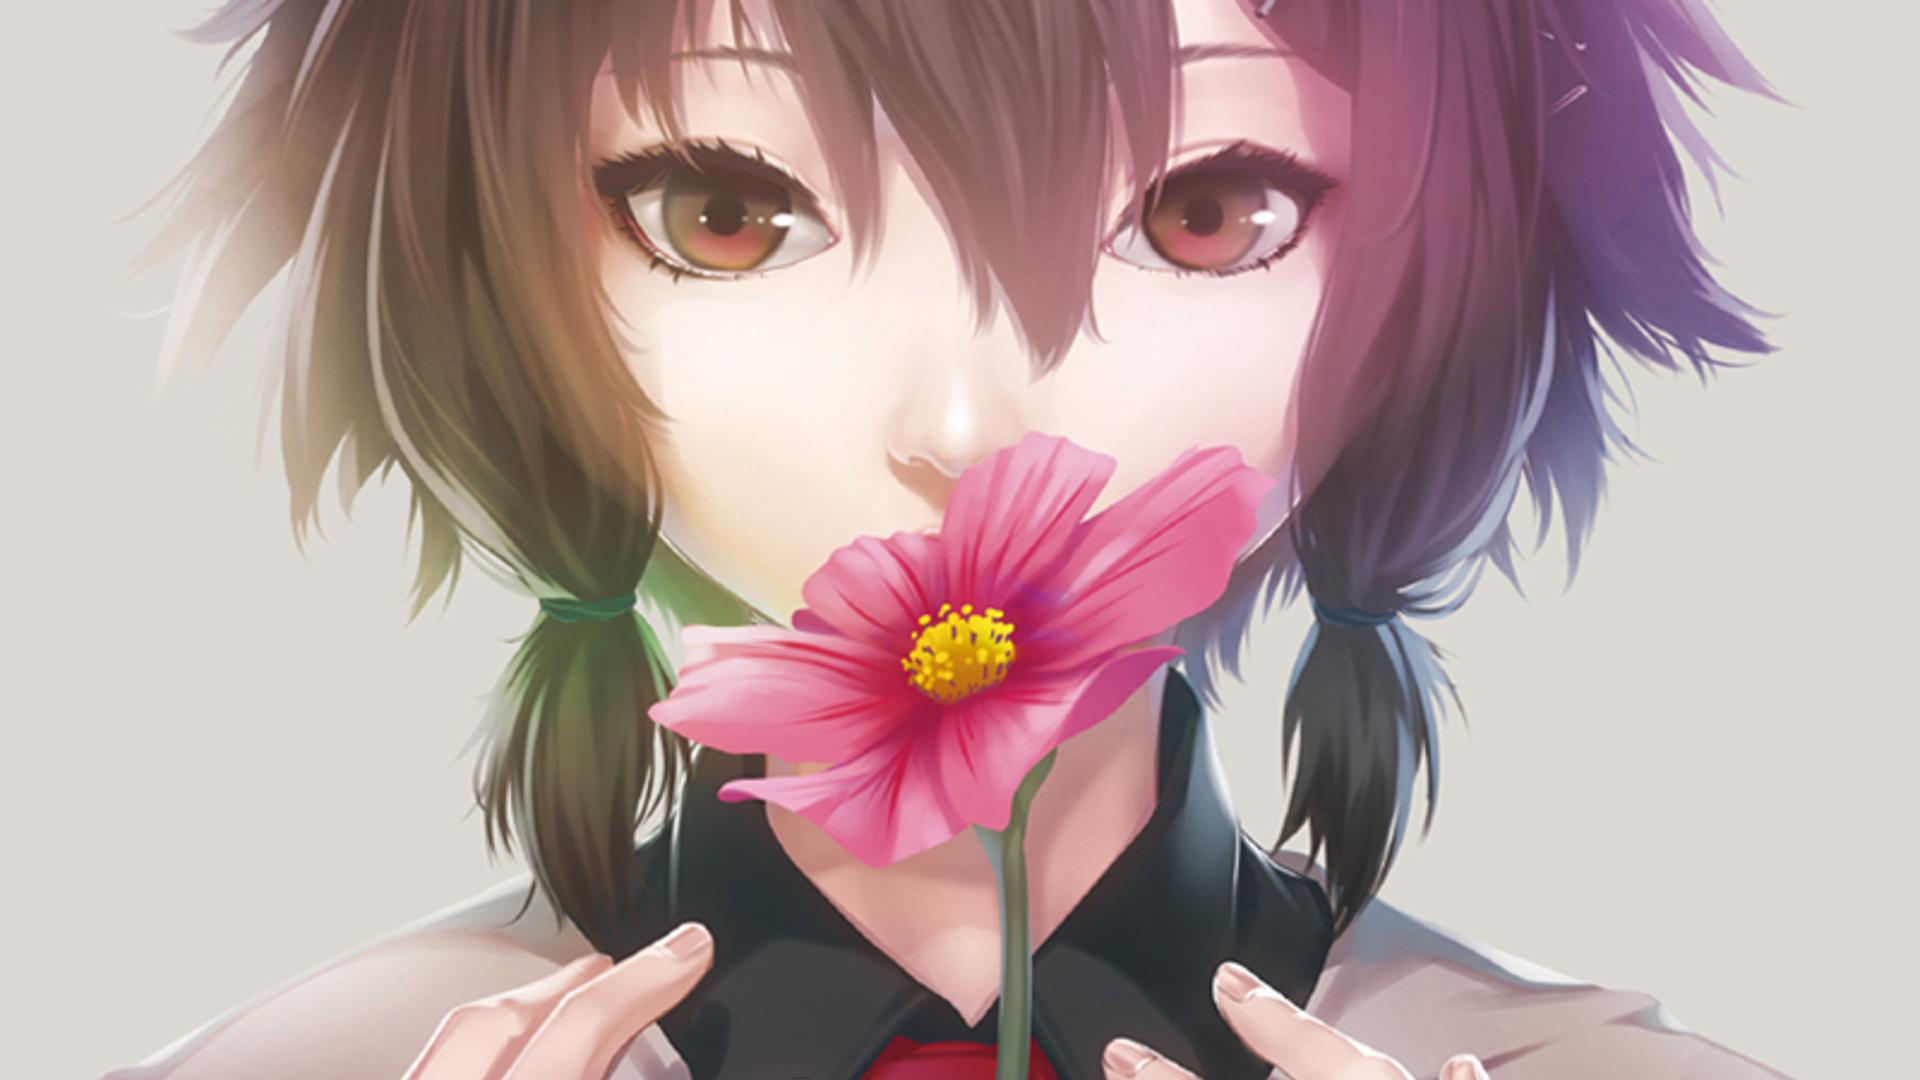 Цветок аниме